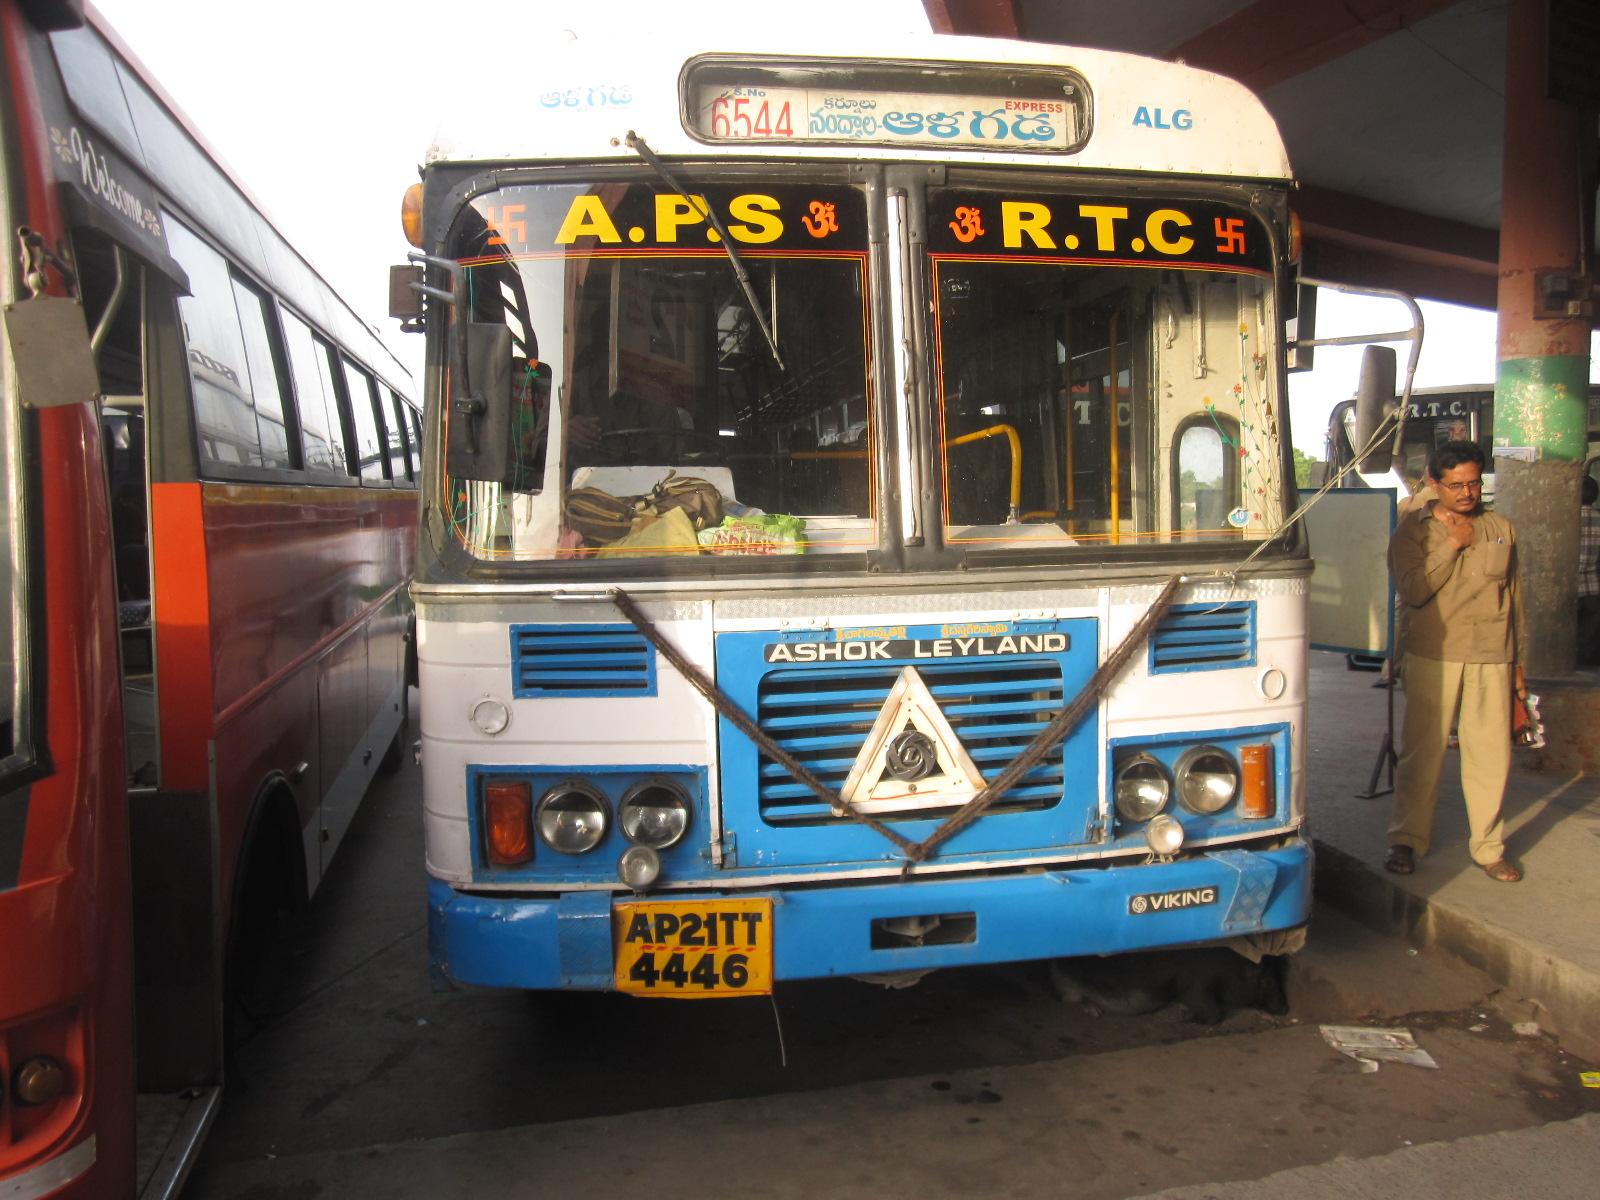 A P S R T C Fans: Hyderabad - Mantralayam - Kurnool - Allampur